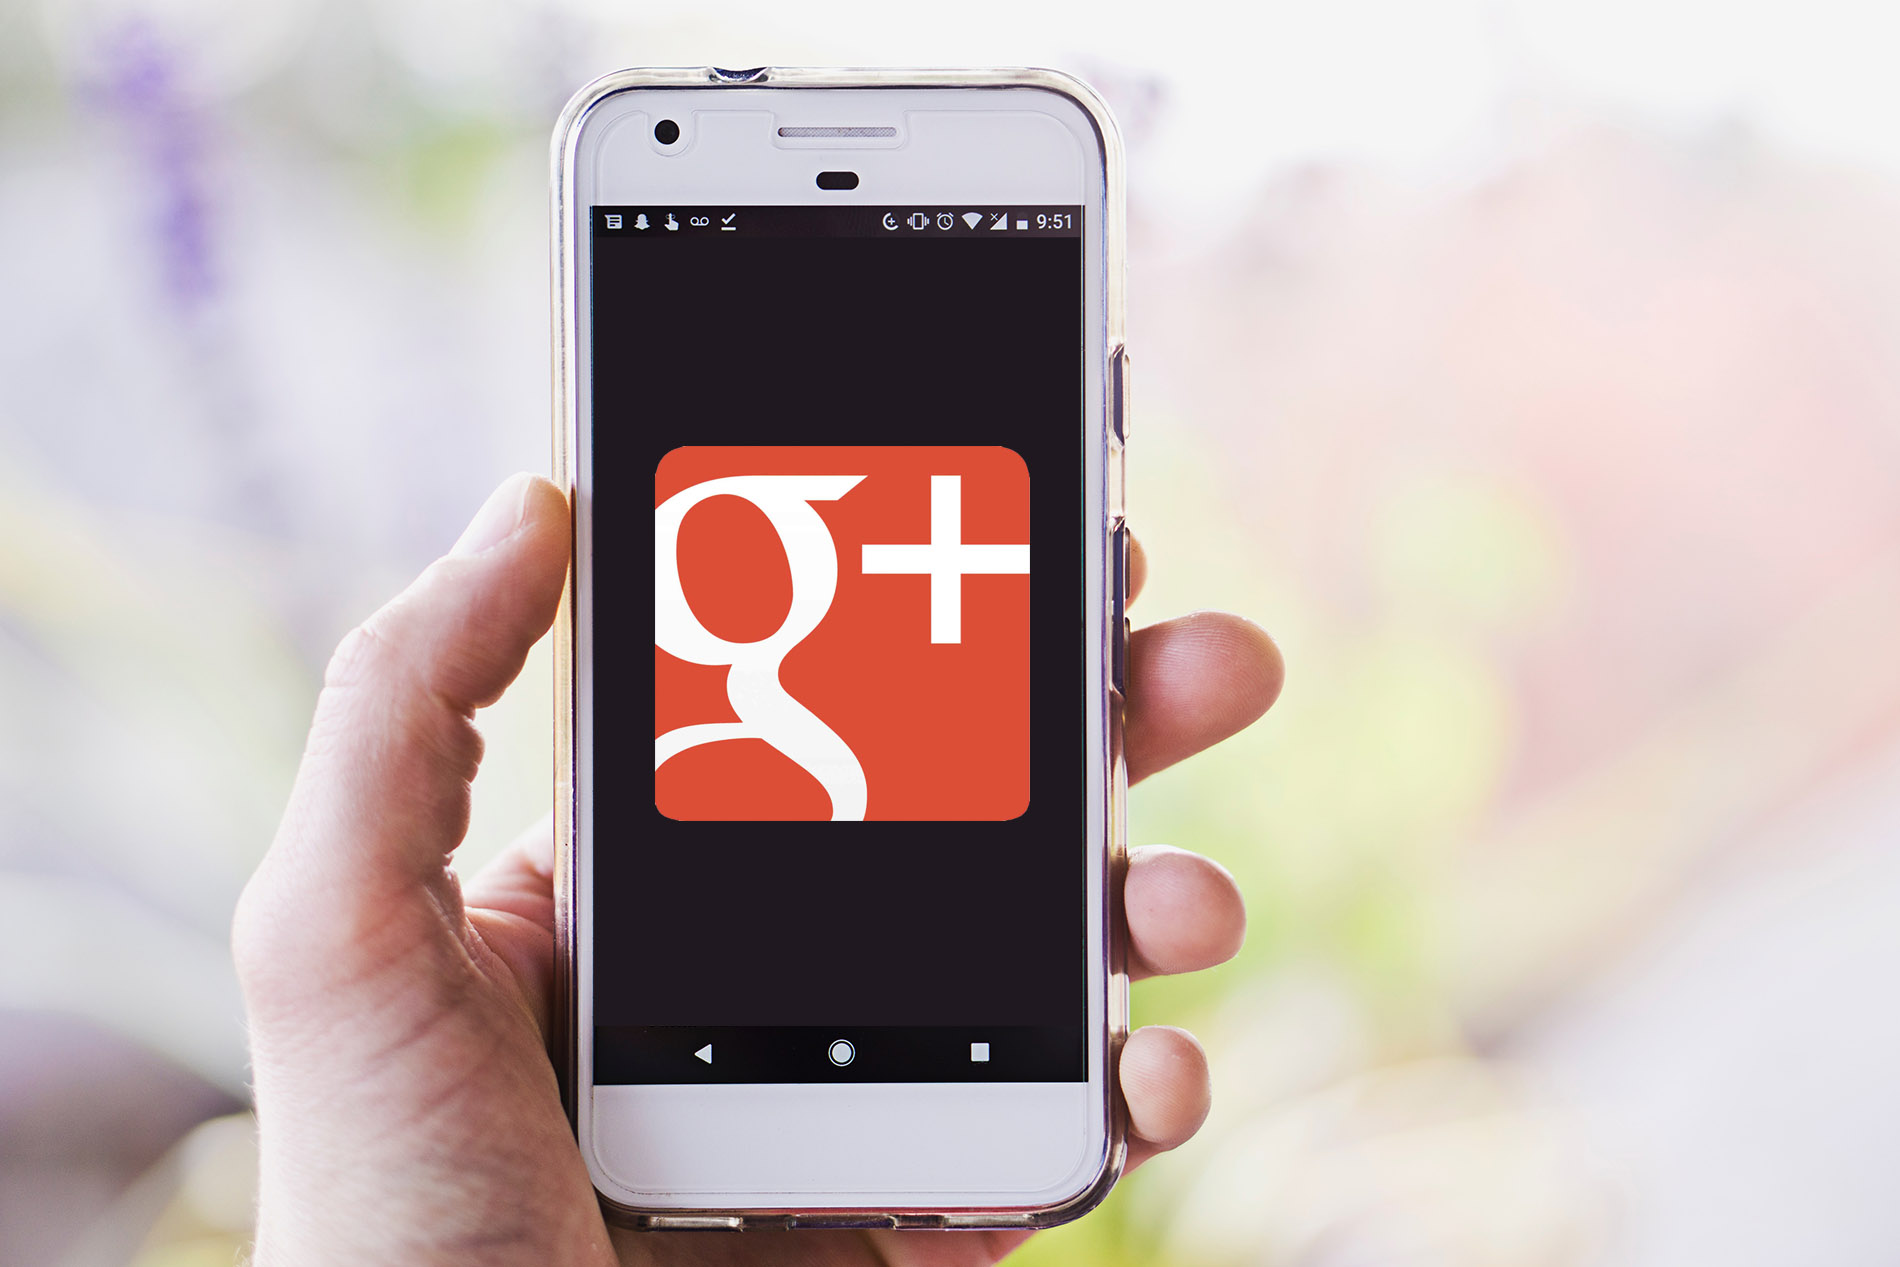 Google Decides to Shut Down Google+